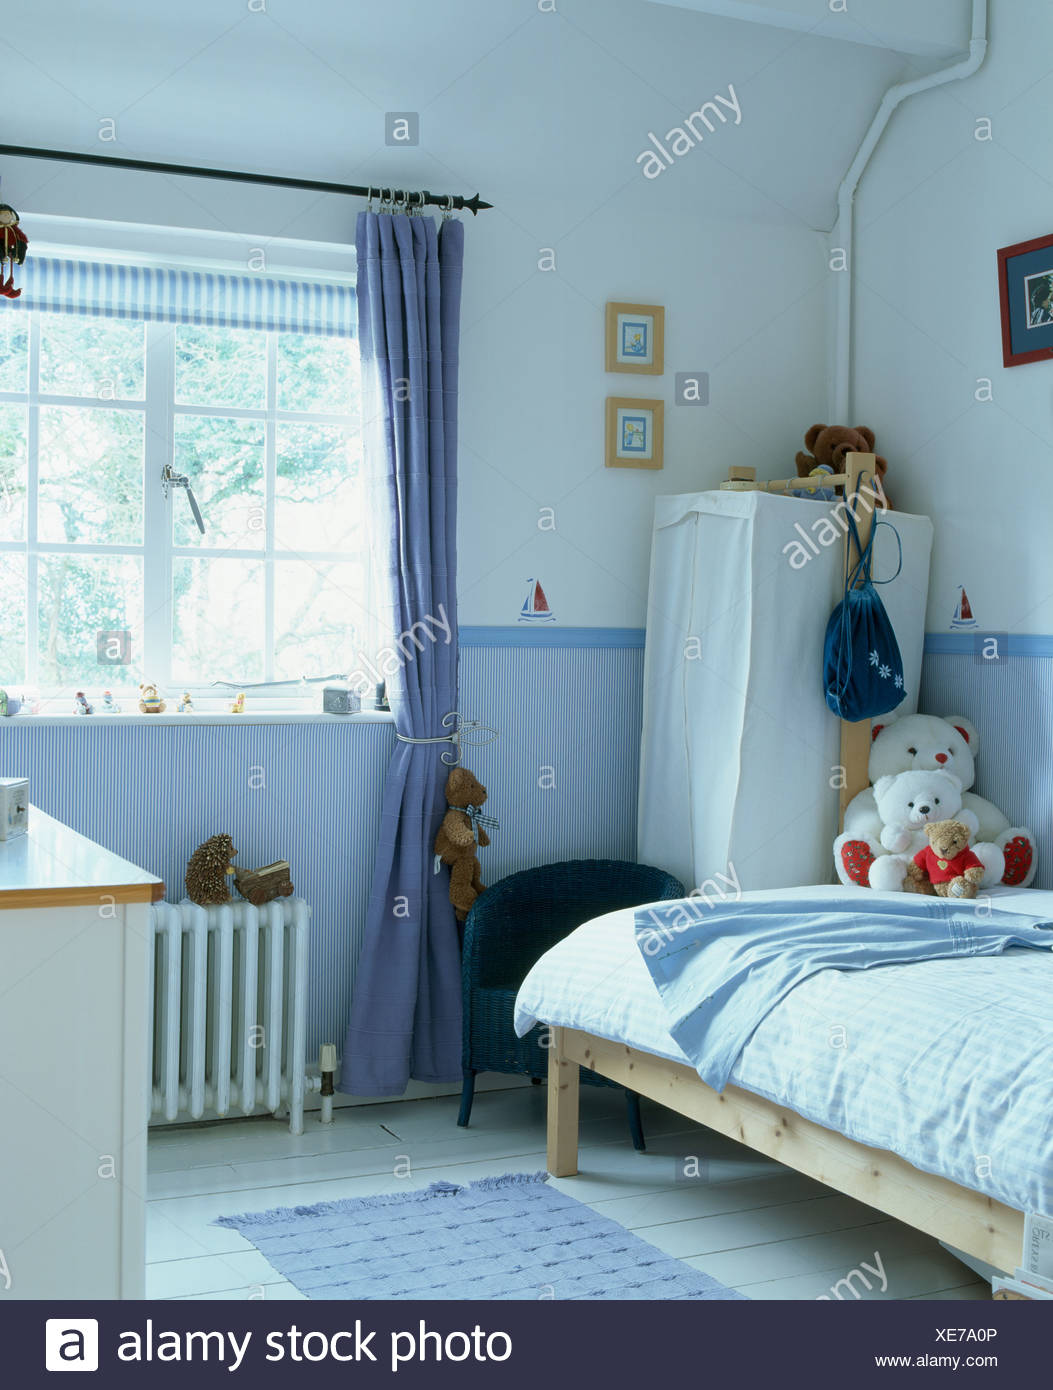 Childrens Bedroom Storage Stock Photos & Childrens Bedroom ...